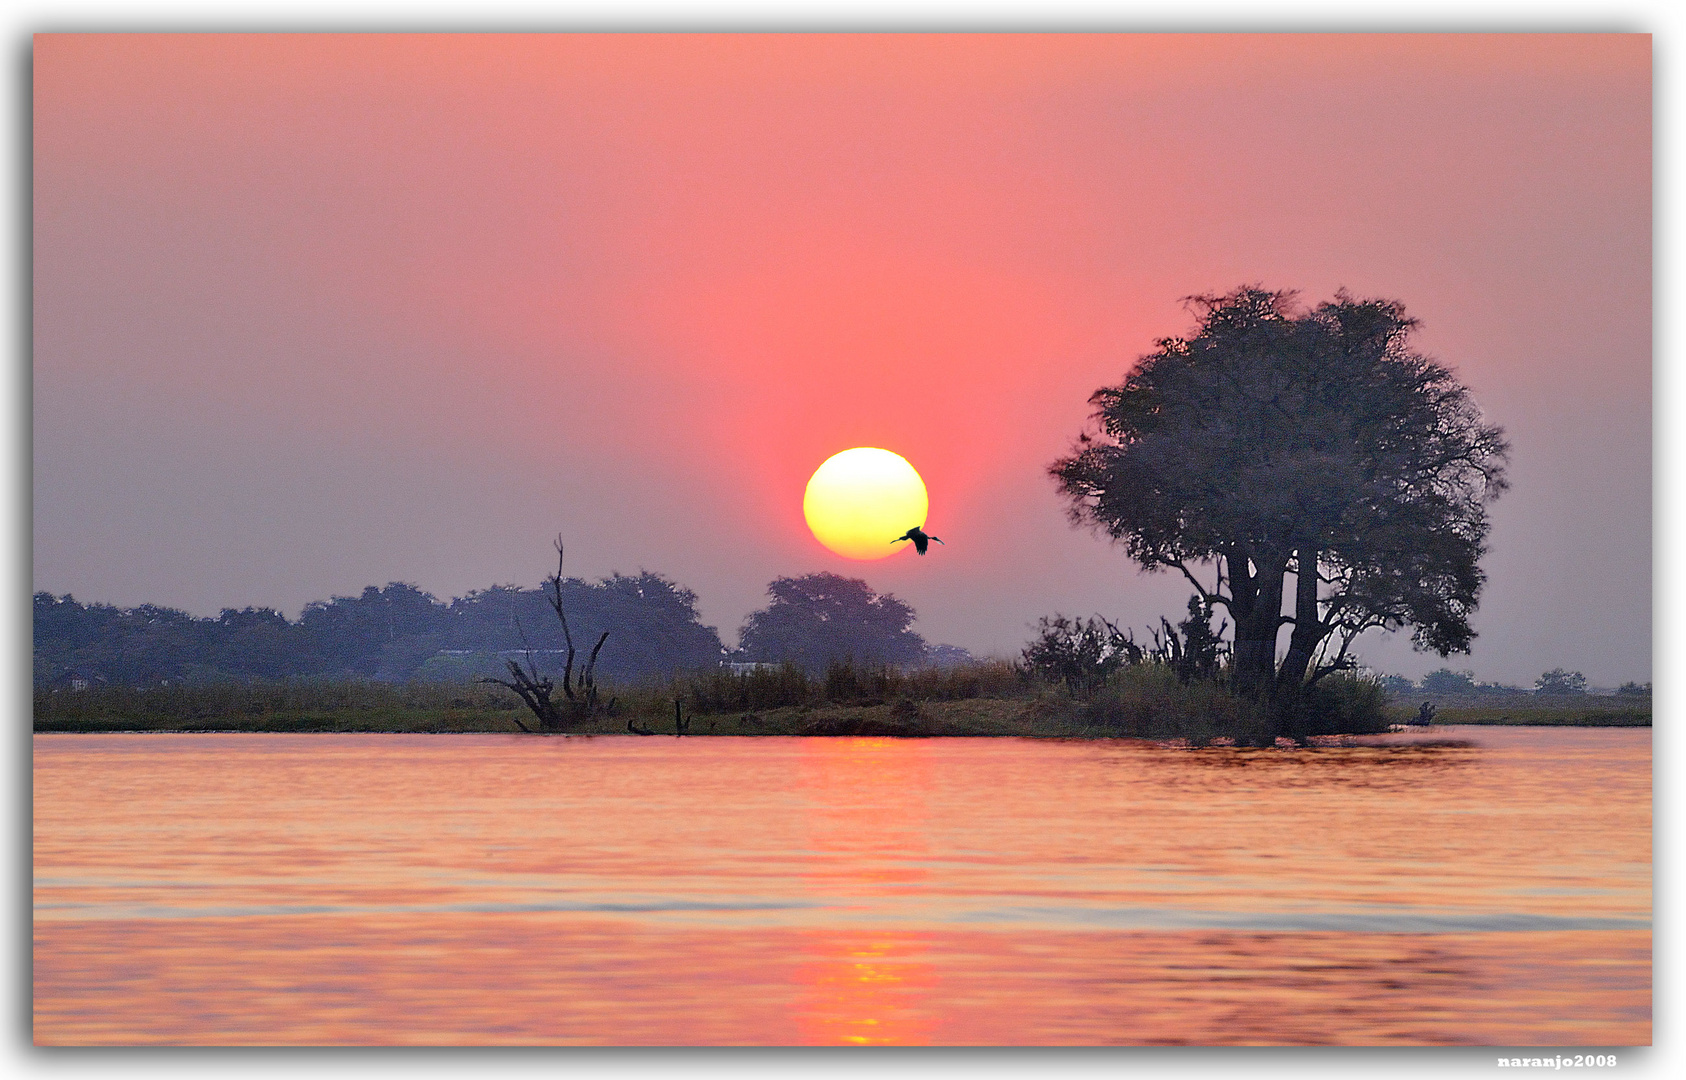 MEMORIAS DE AFRICA -ATARDECER EN EL ZAMBEZE -BOSTWANA